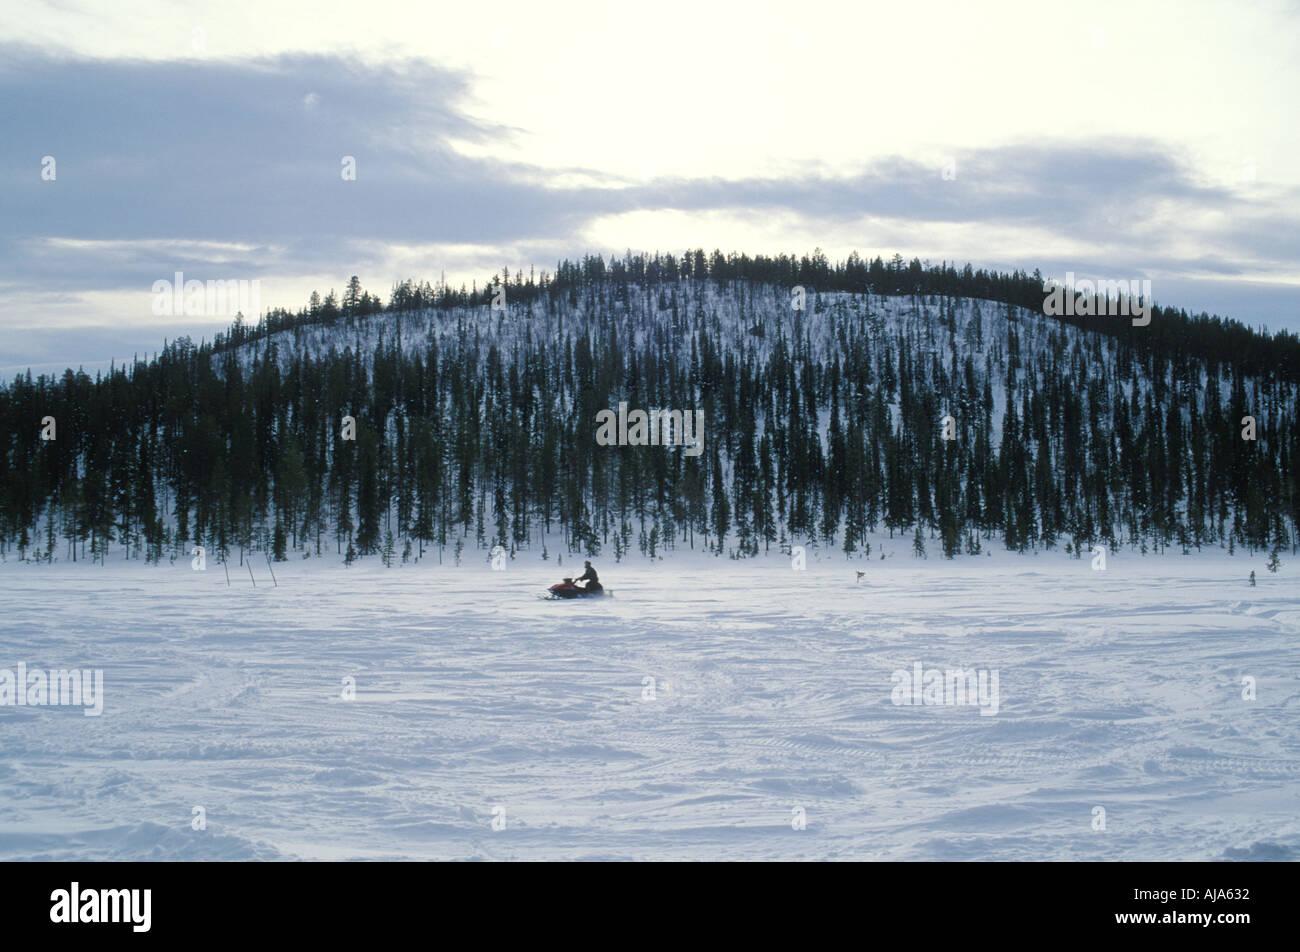 Jukkas Jarvi Lappland Sweden Skidoo on frozen lake - Stock Image